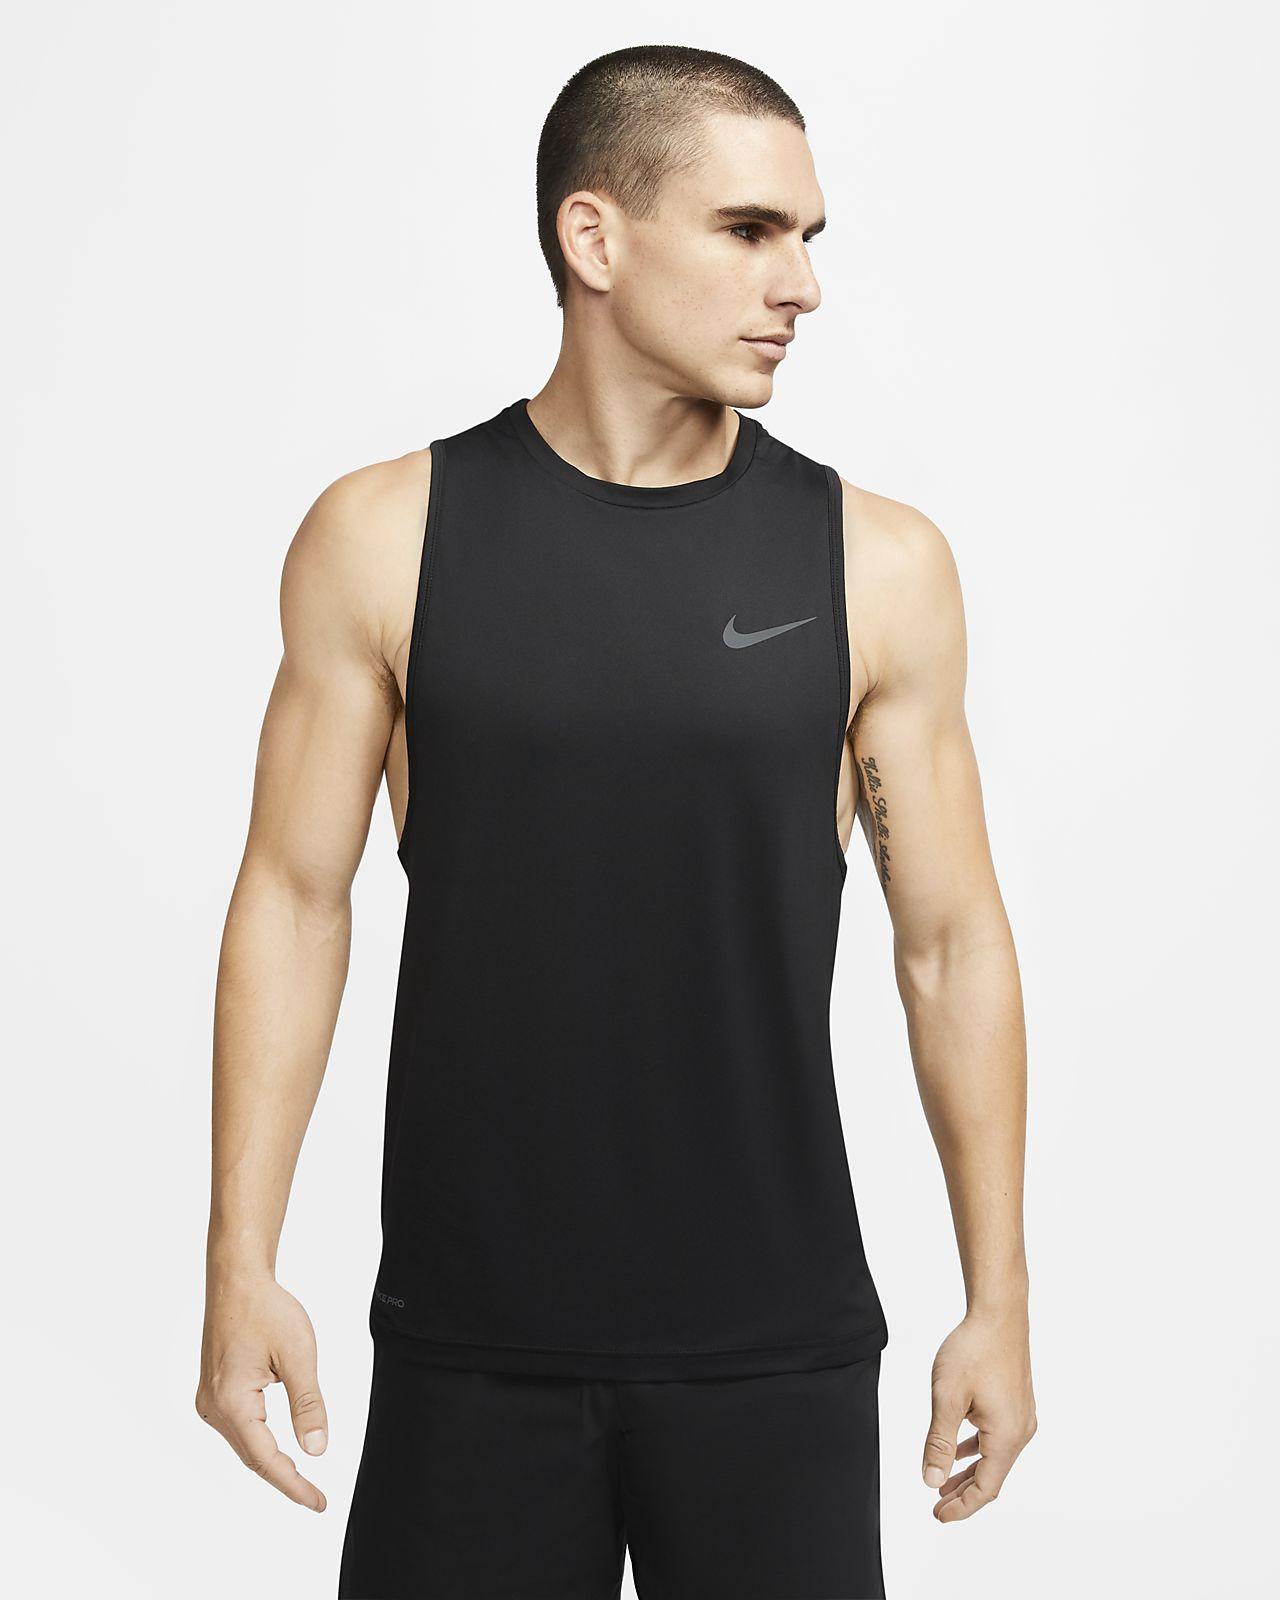 Męska koszulka treningowa bez rękawów